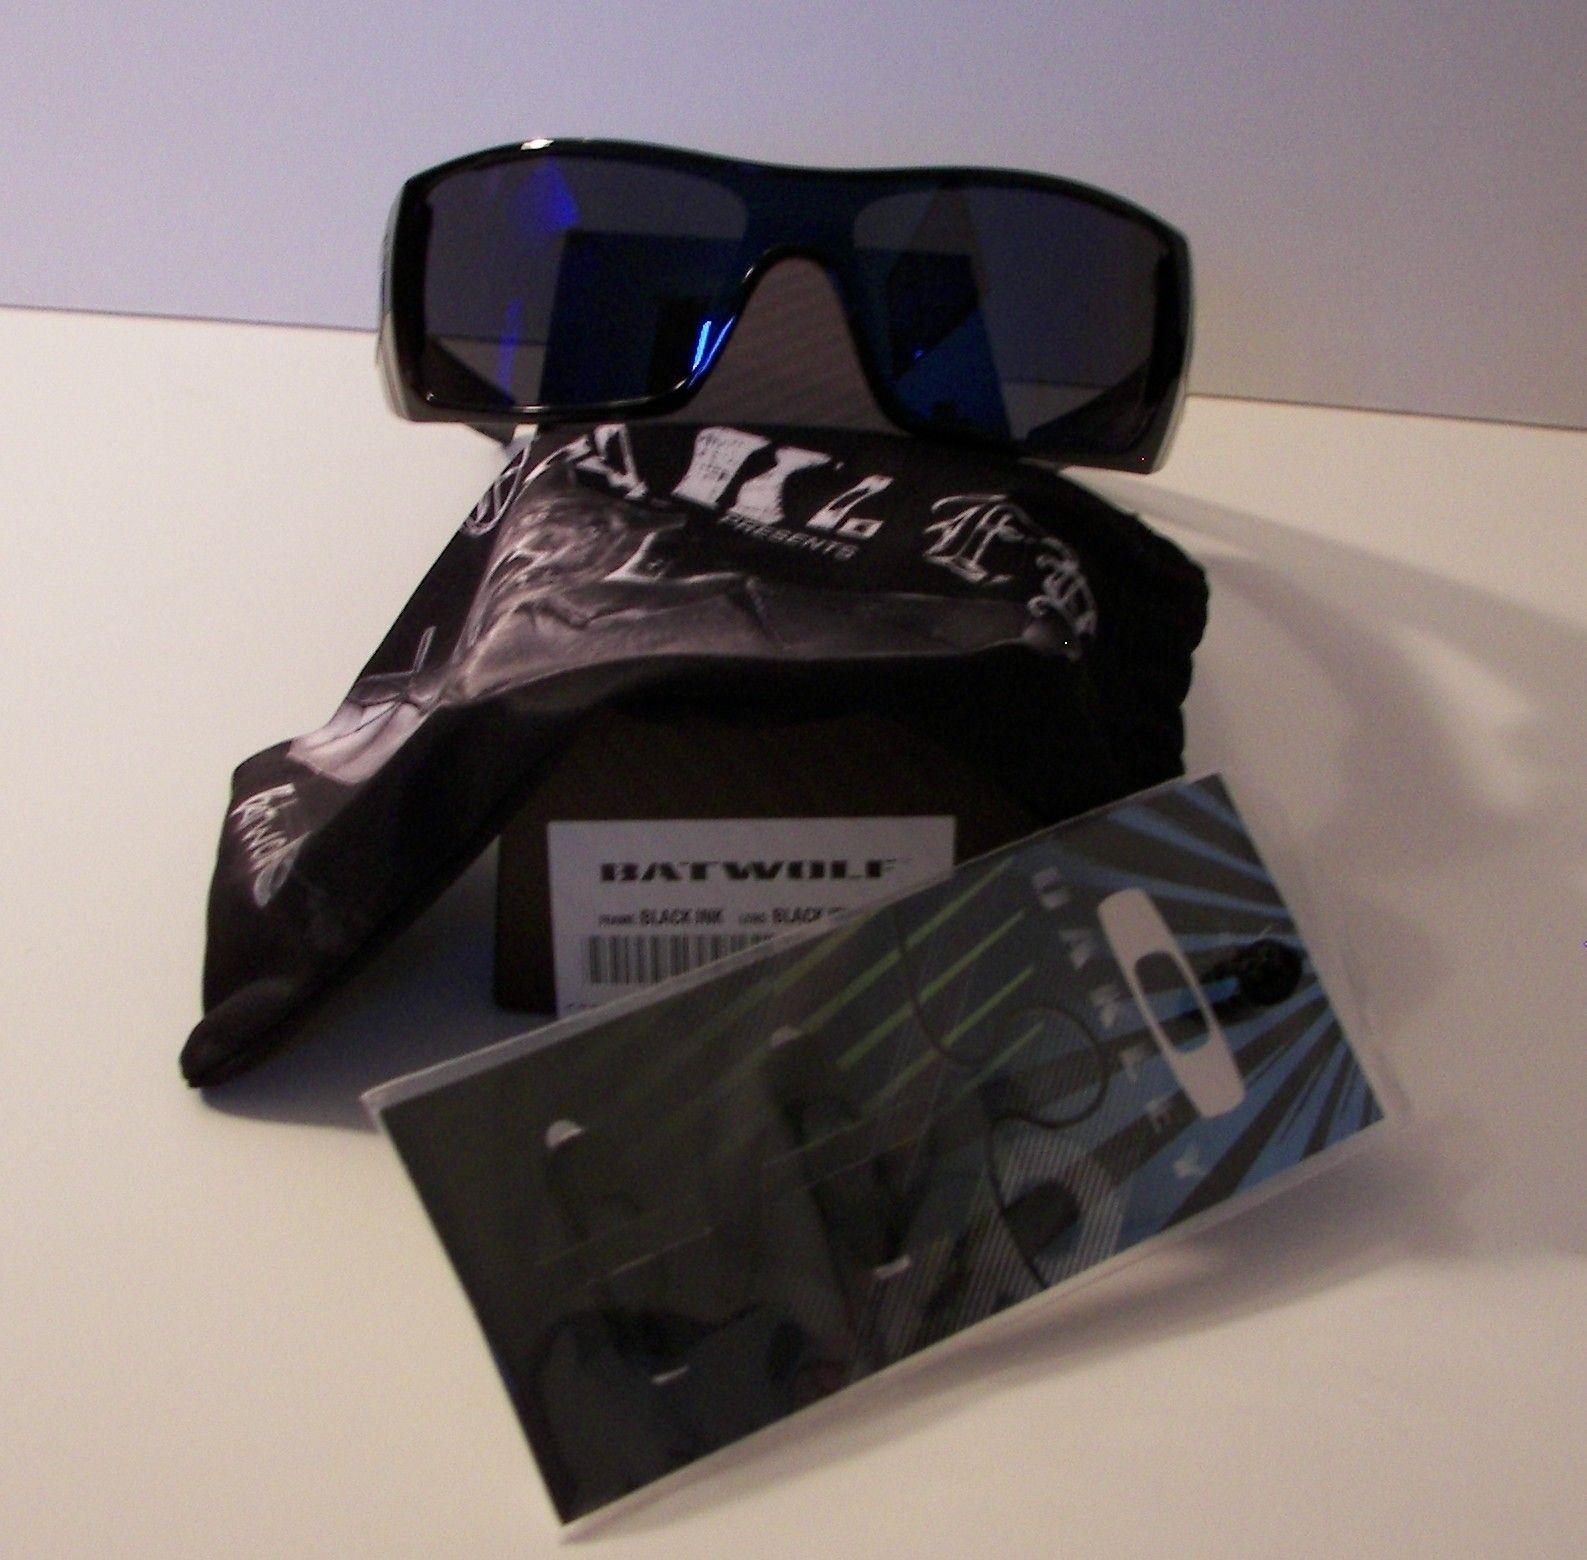 Oakley Batwolf Black Ink/Ice Iridium - batwolfblackinkiceandicj.jpg